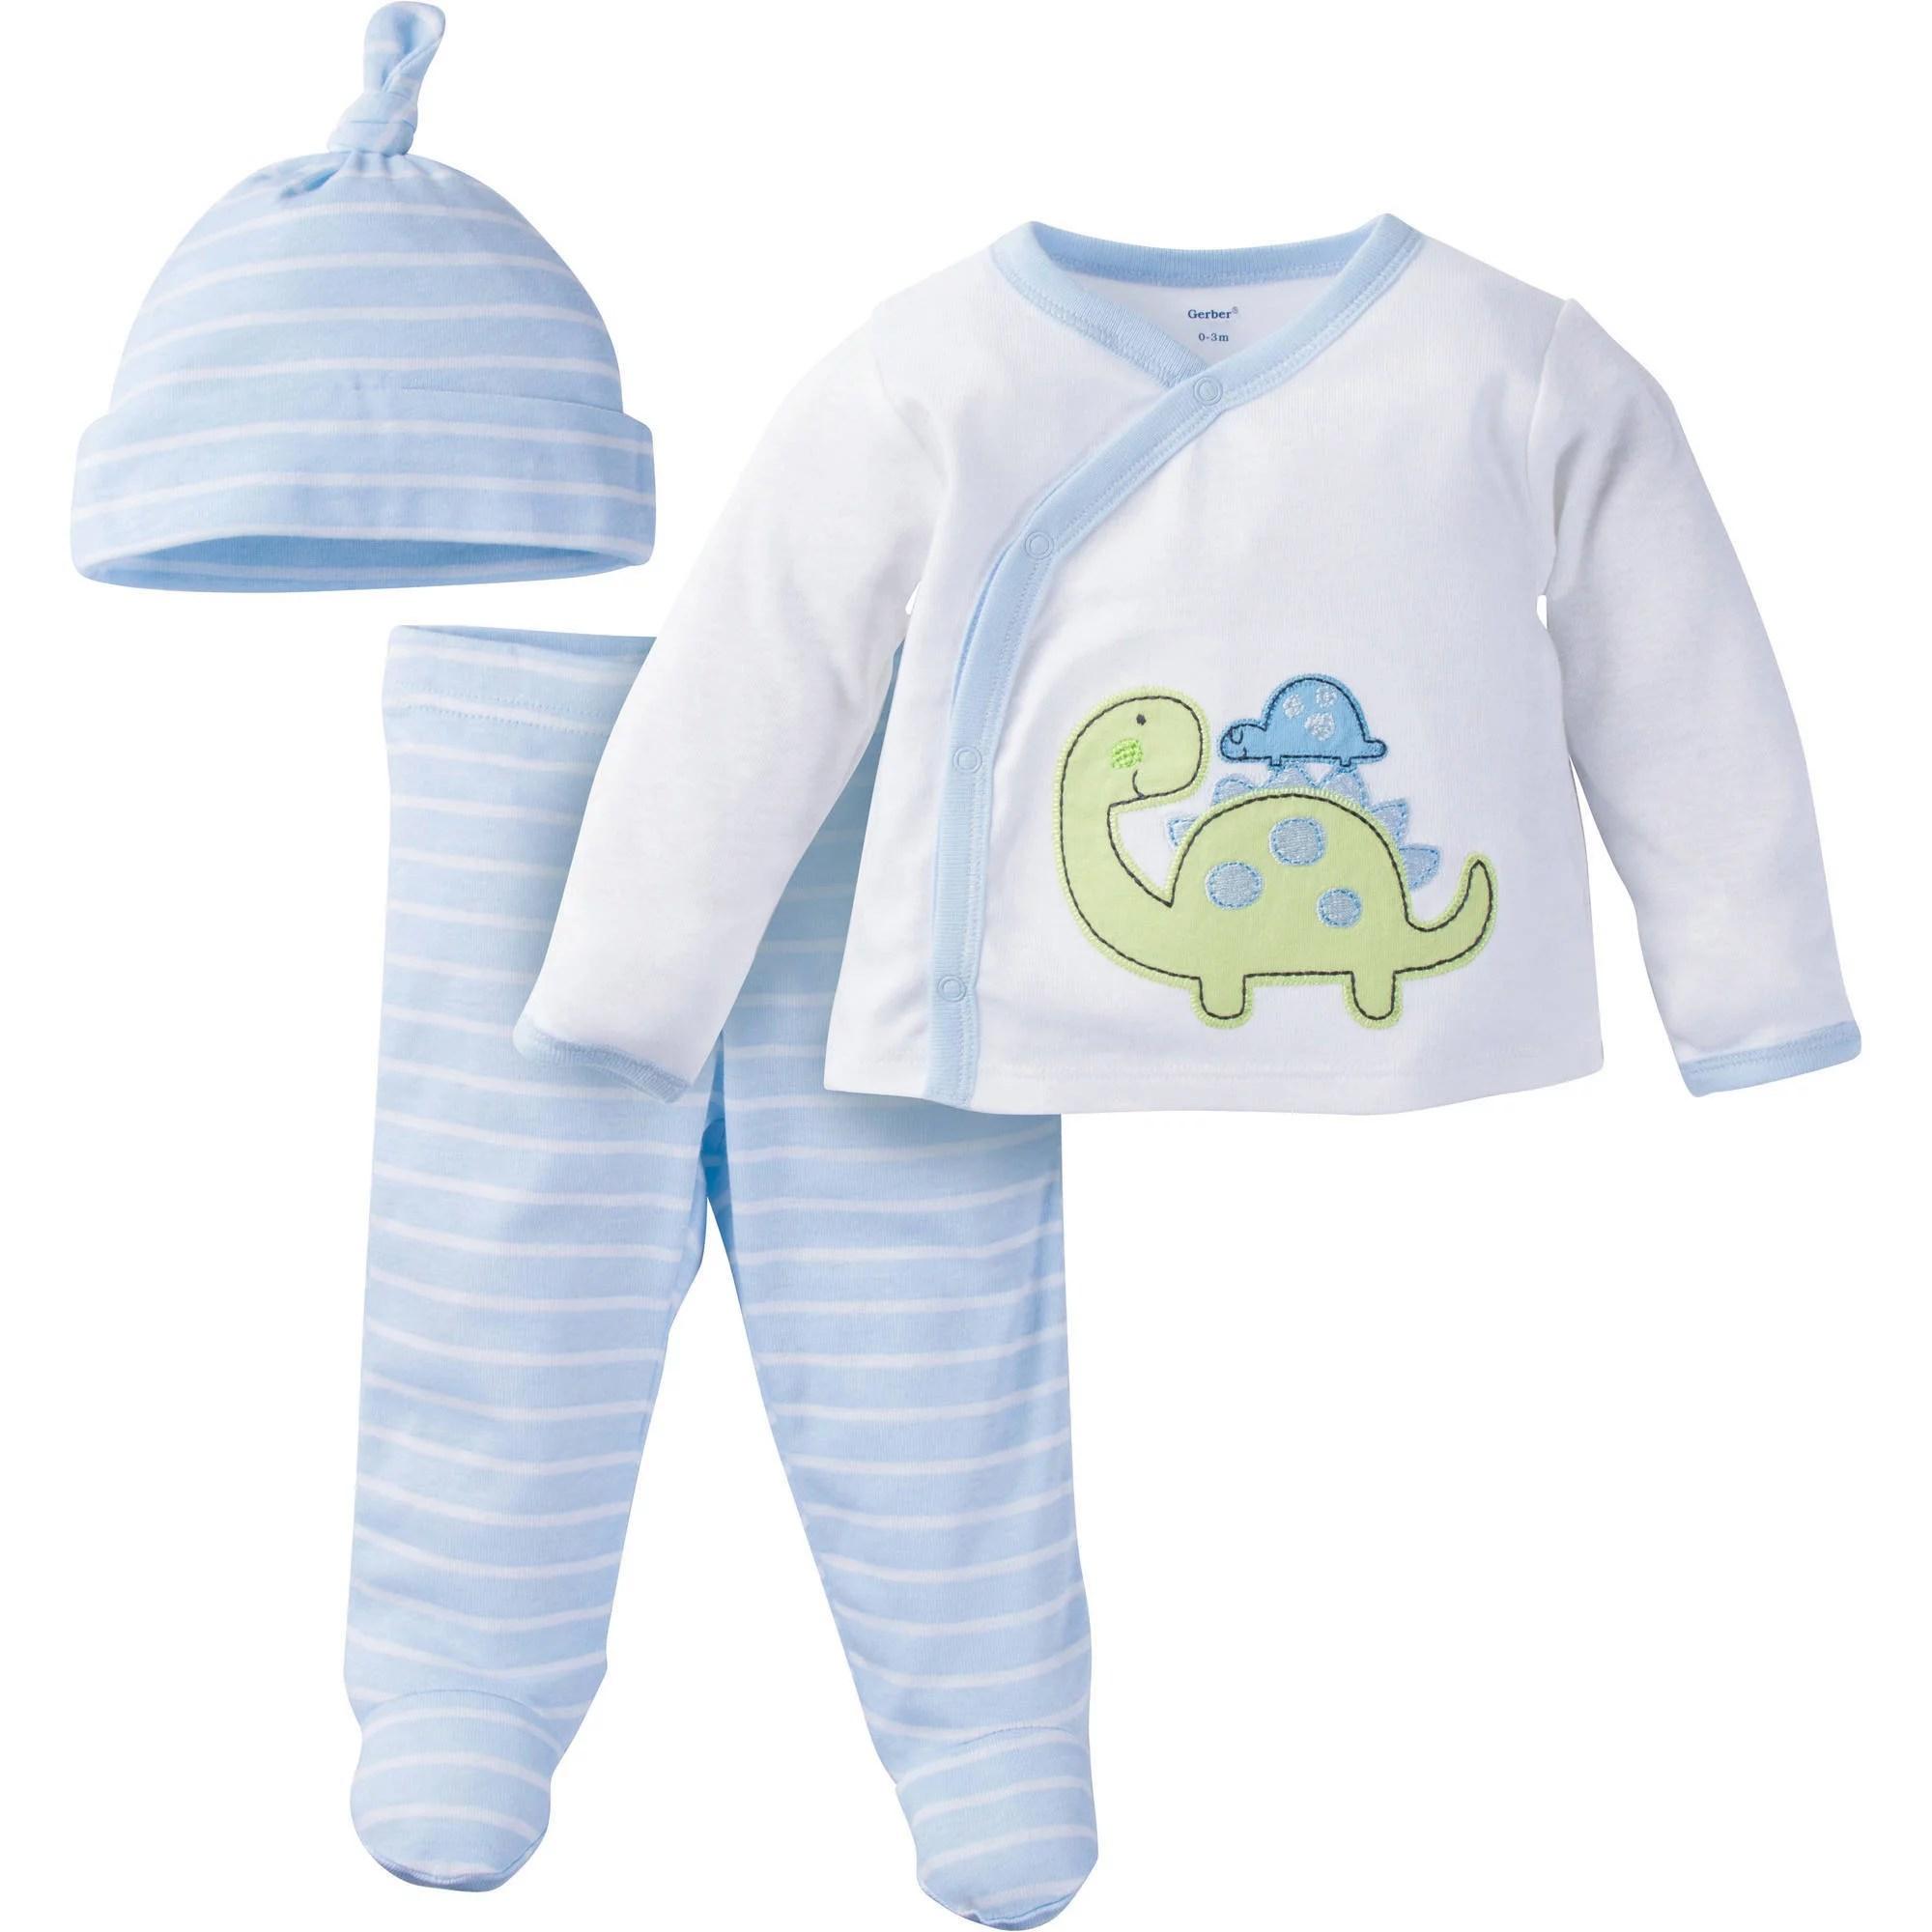 gerber newborn baby boy take me home outfit set 3 piece